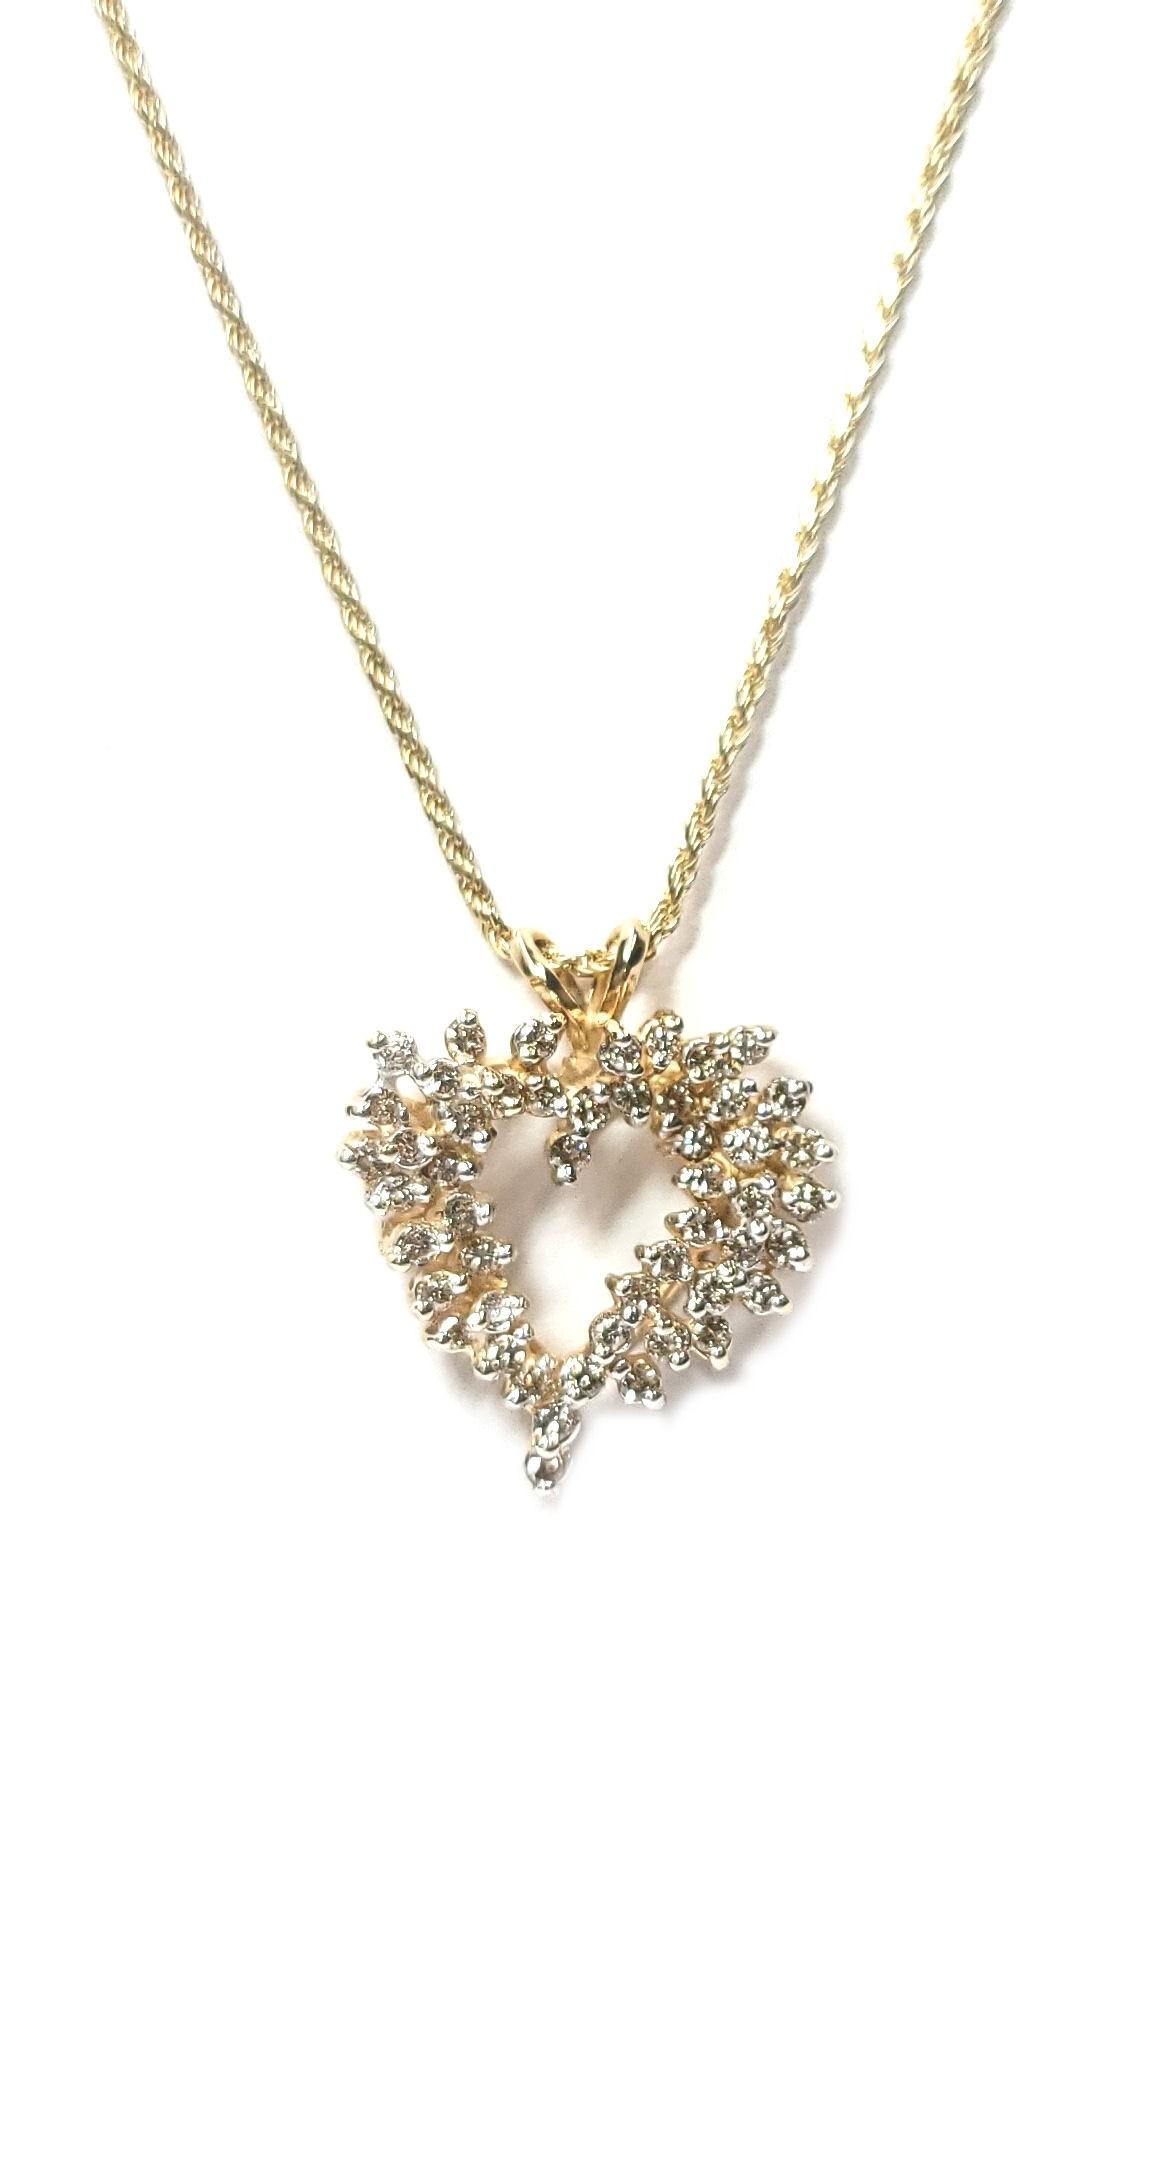 Diamond Heart Pendant Freeform Design 1ct, in 14kt Gold